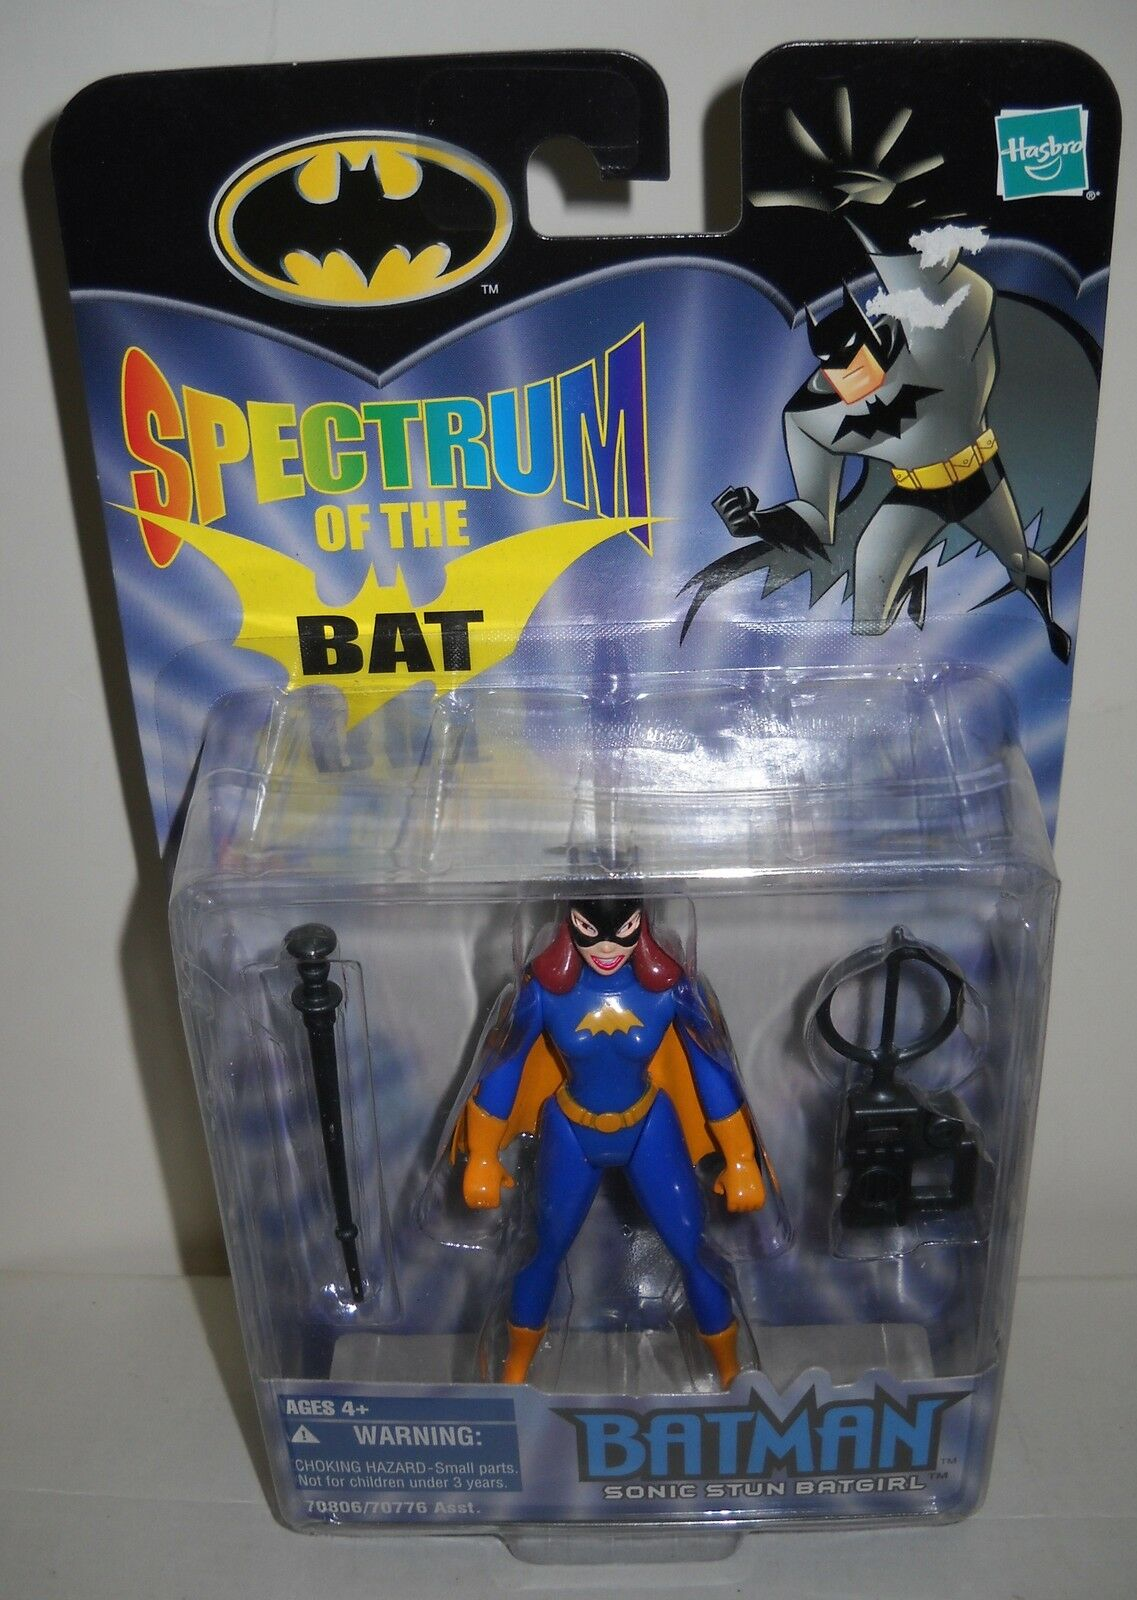 NRFC Hasbro Spectrum of the Bat - Batman Sonic Stun Batgirl Action Figure